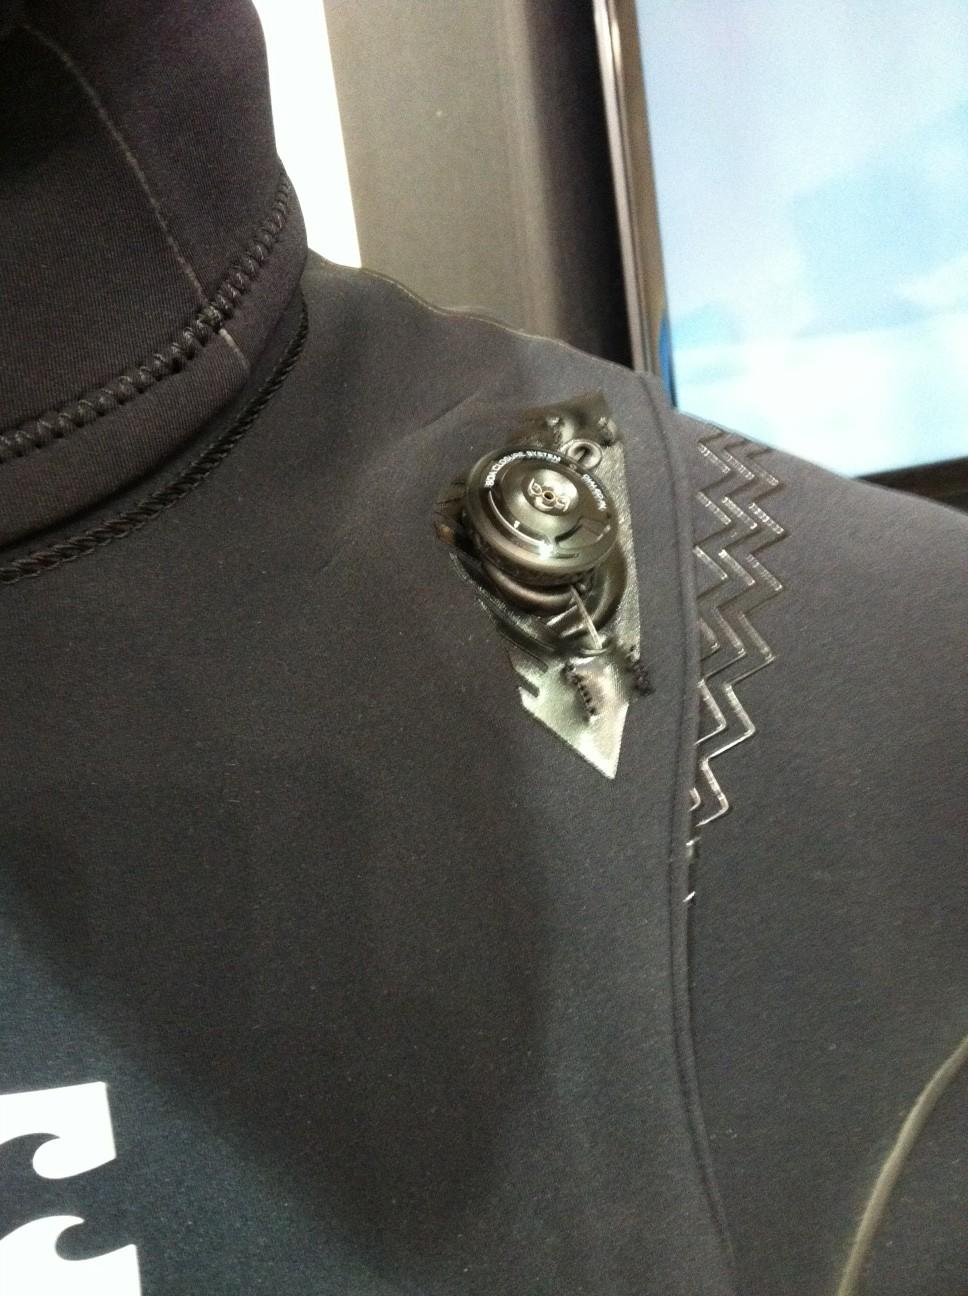 Billabong Furnace Carbon Wetsuit. Der erste zip-lose Wetsuit mit BOA System